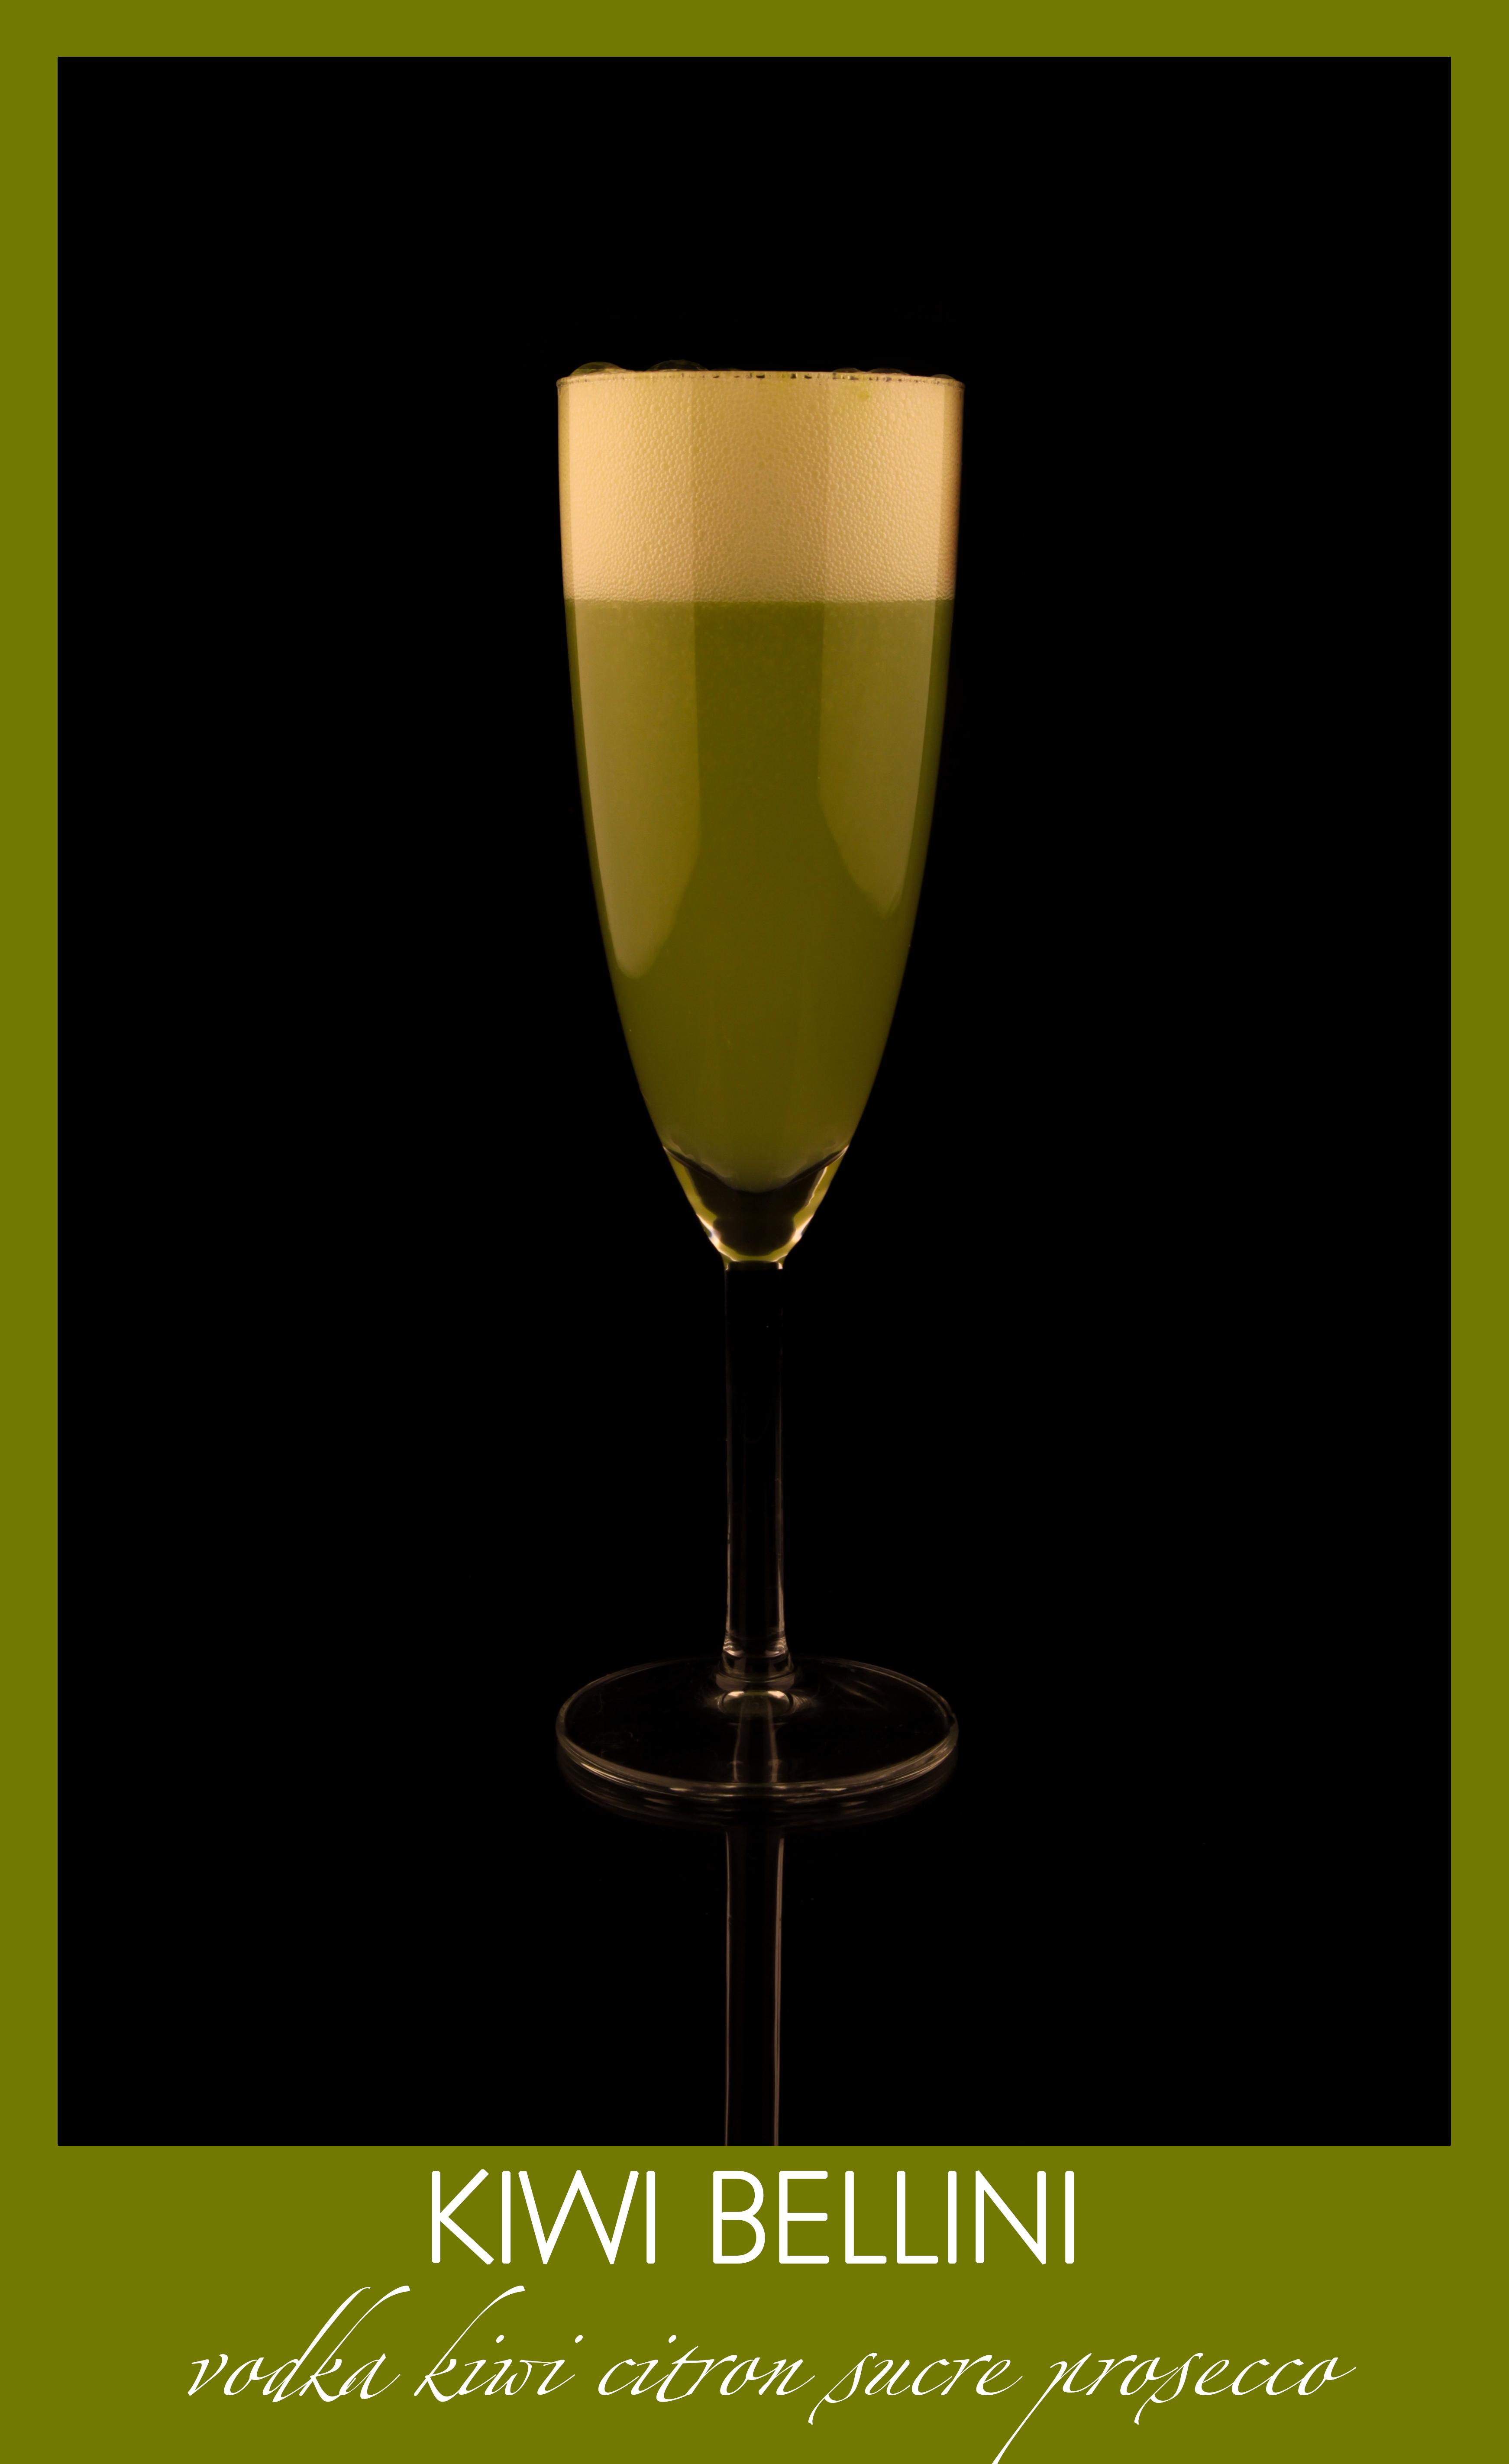 Kiwi Bellini.jpg